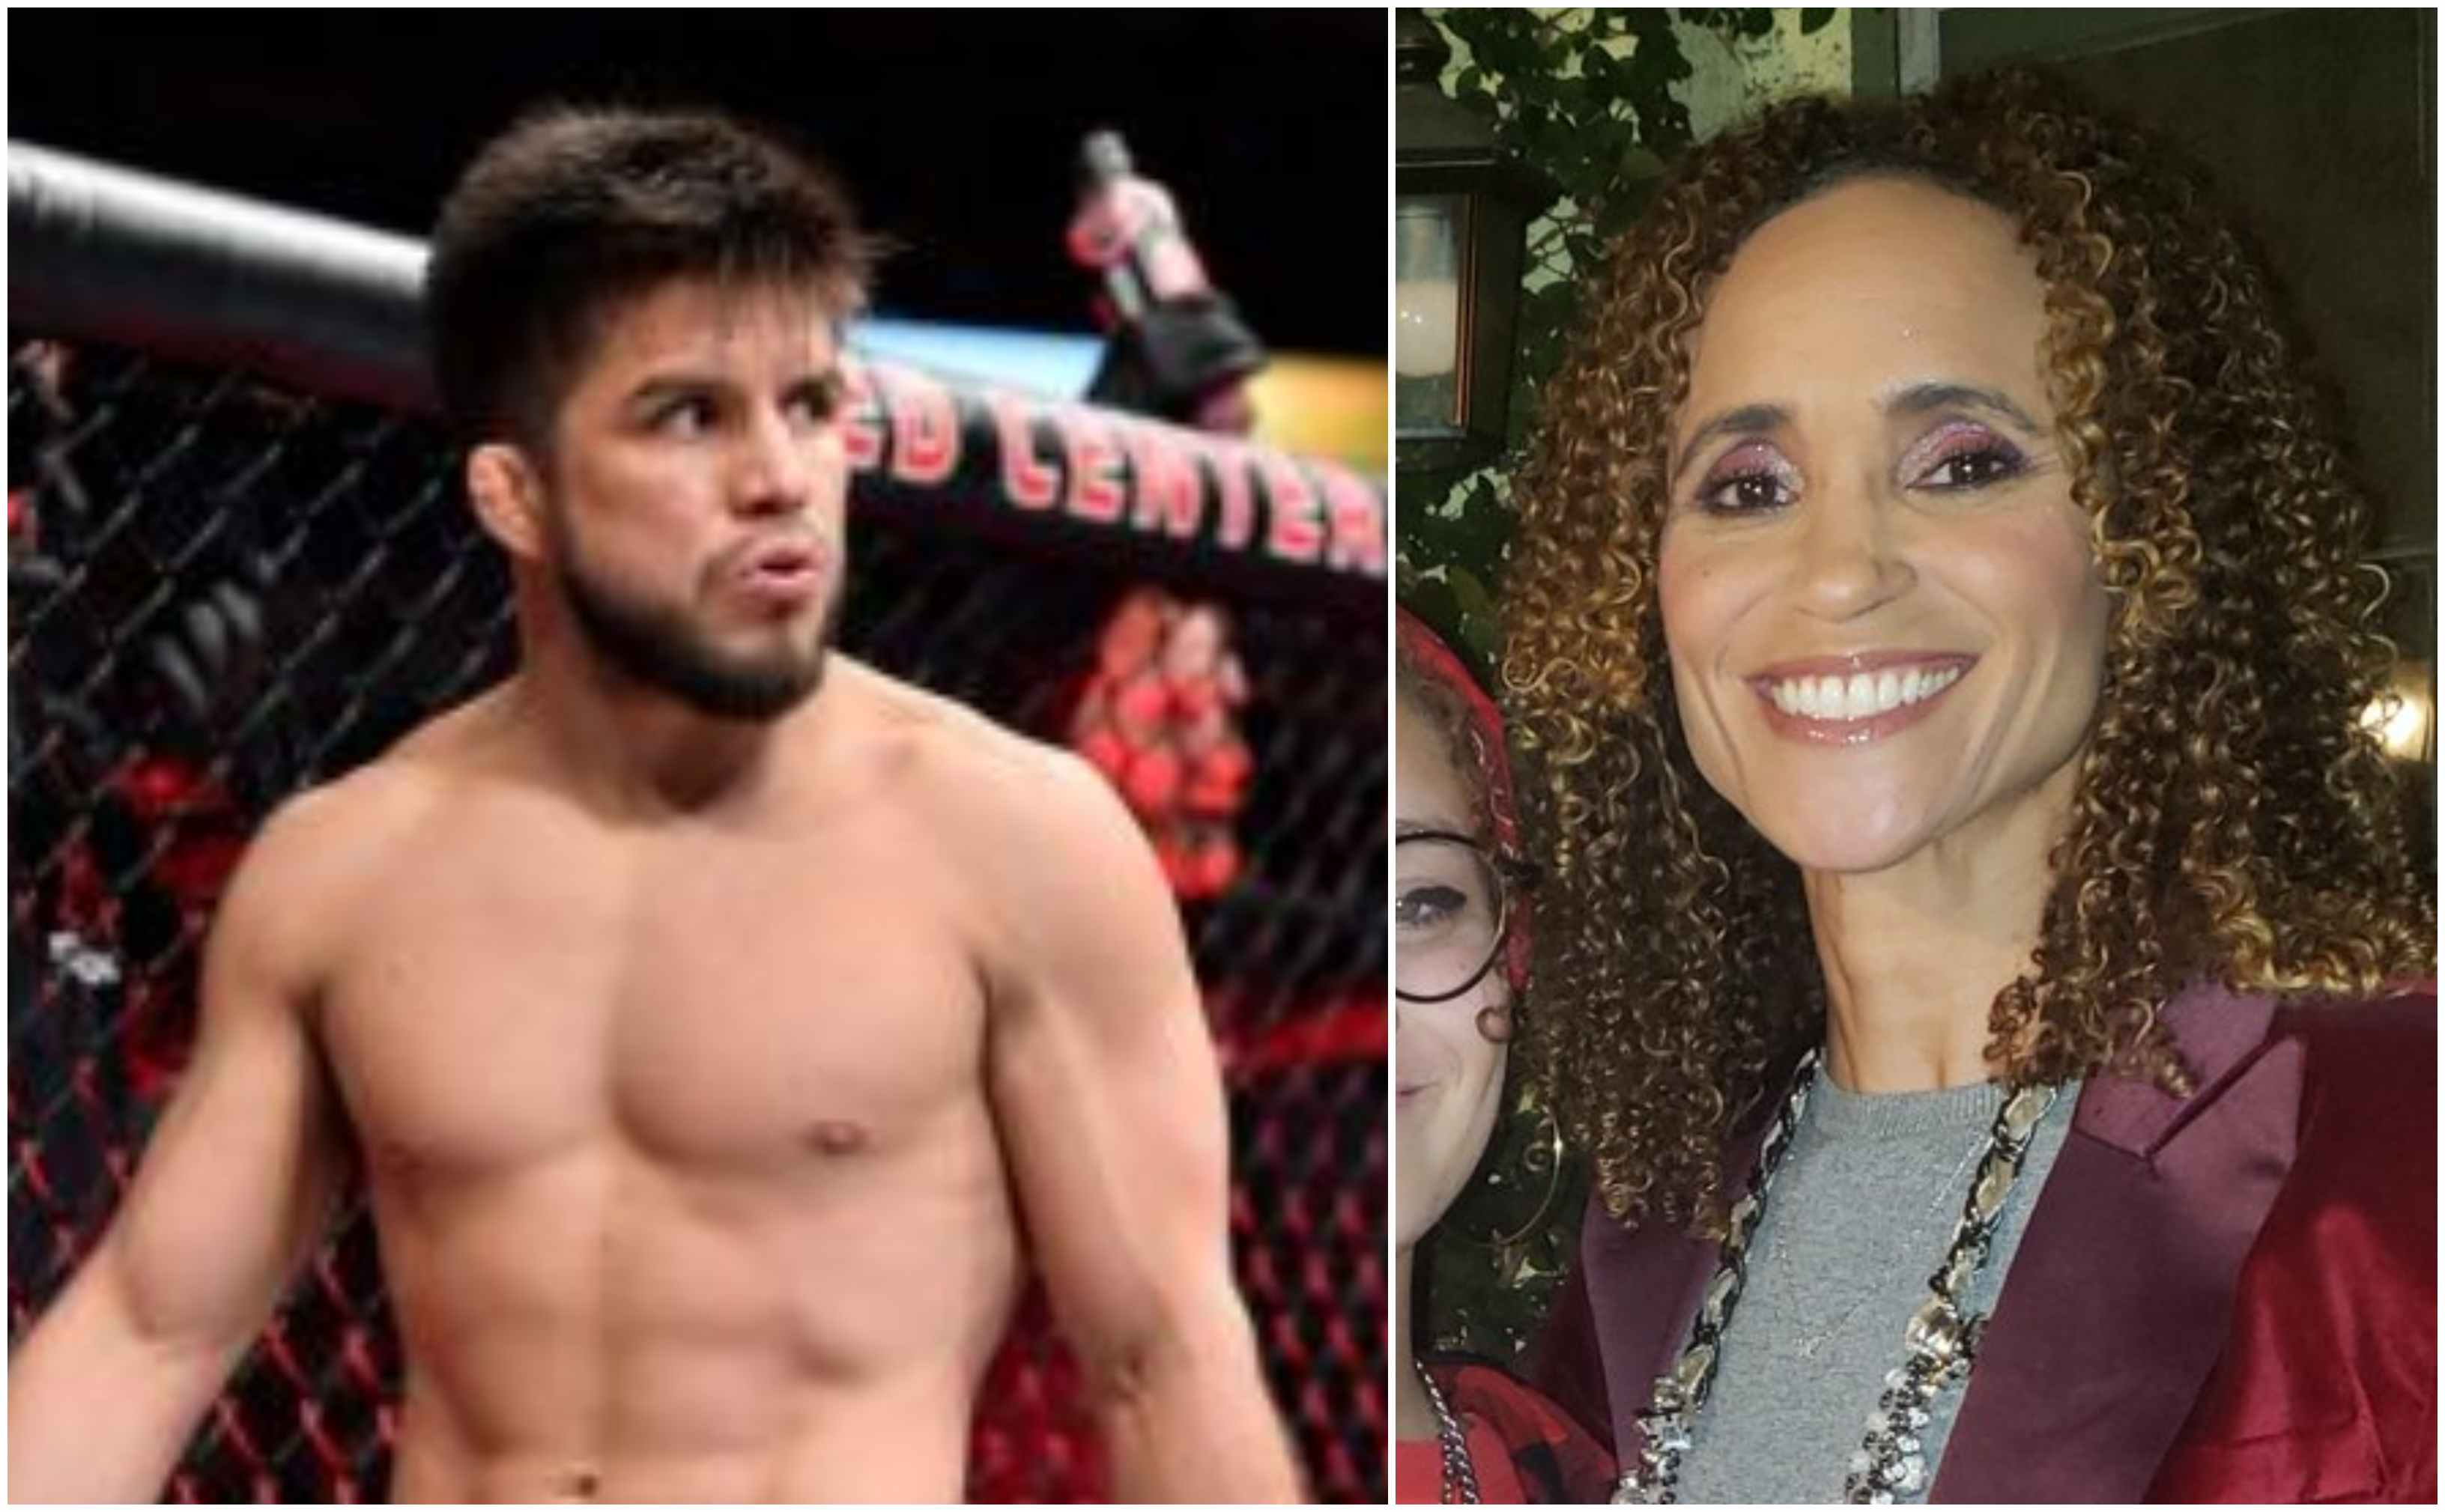 UFC News: Henry Cejudo gets called out for racist remarks against Aljamain Sterling - Aljamain